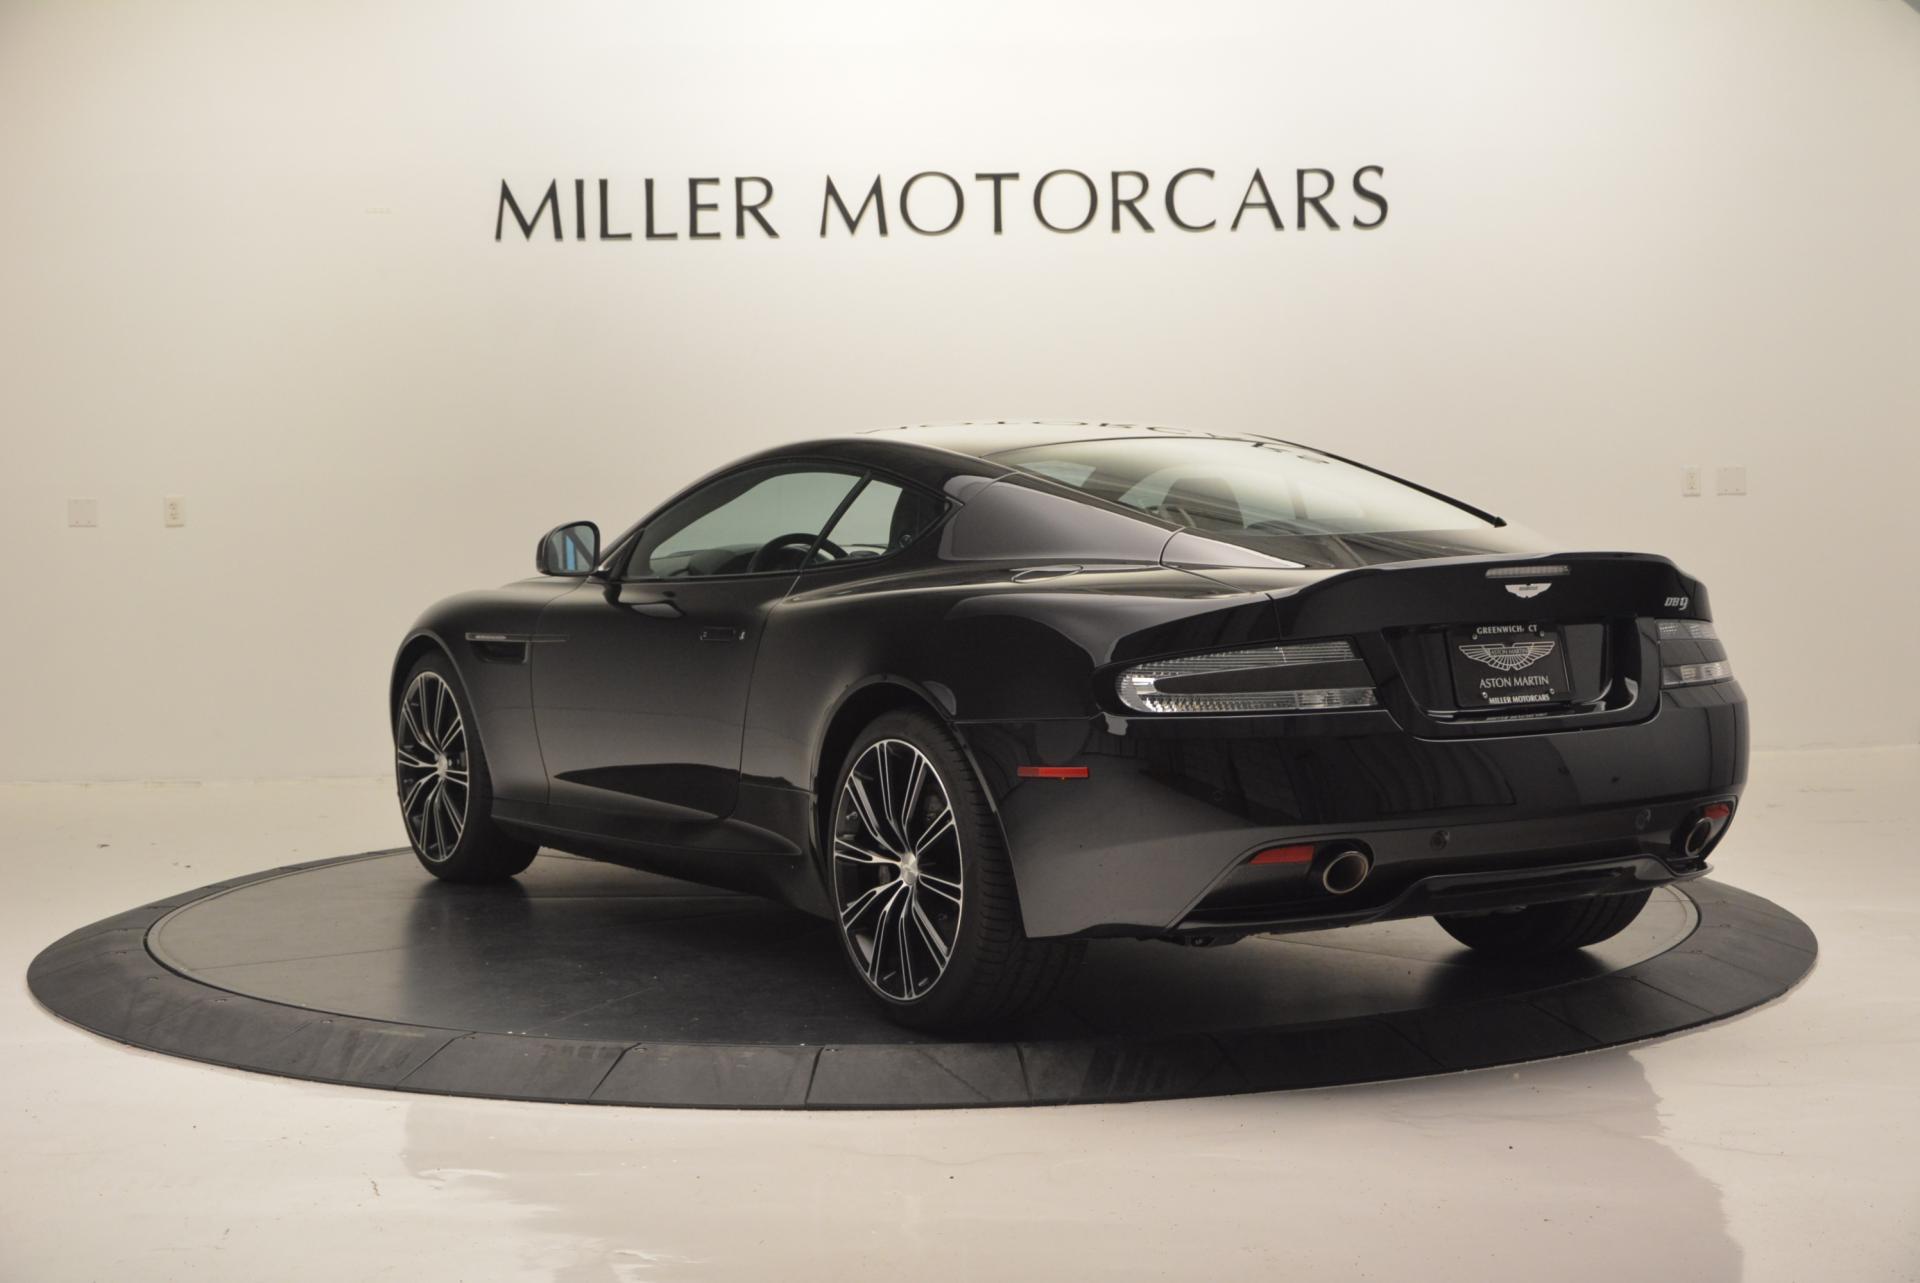 Used 2015 Aston Martin DB9 Carbon Edition For Sale In Greenwich, CT. Alfa Romeo of Greenwich, 7349 528_p5